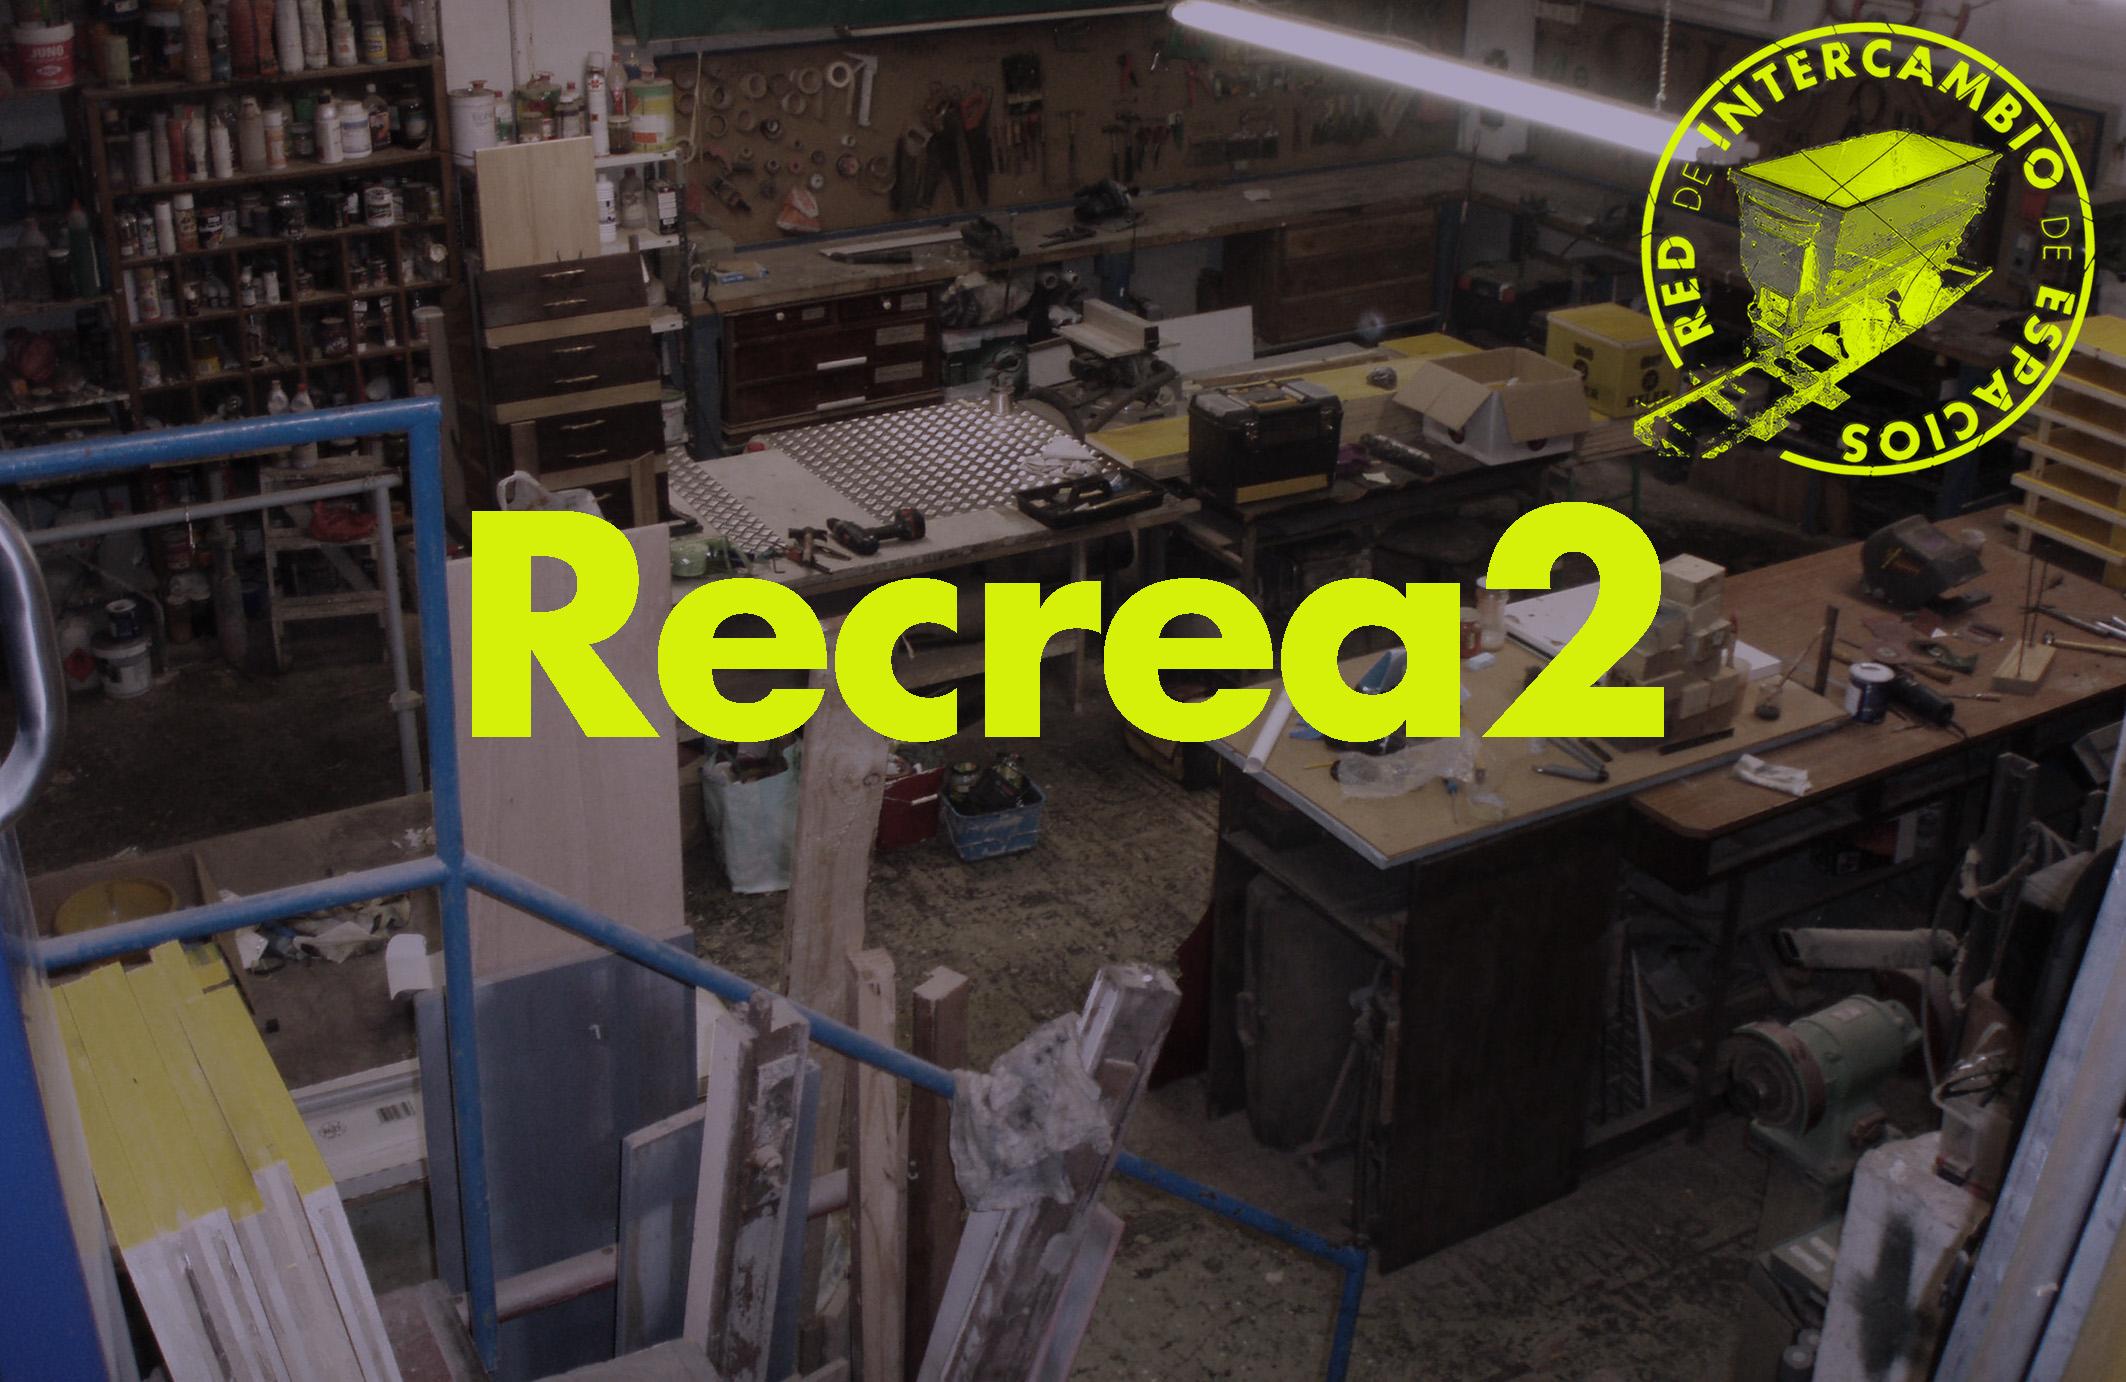 Recrea2